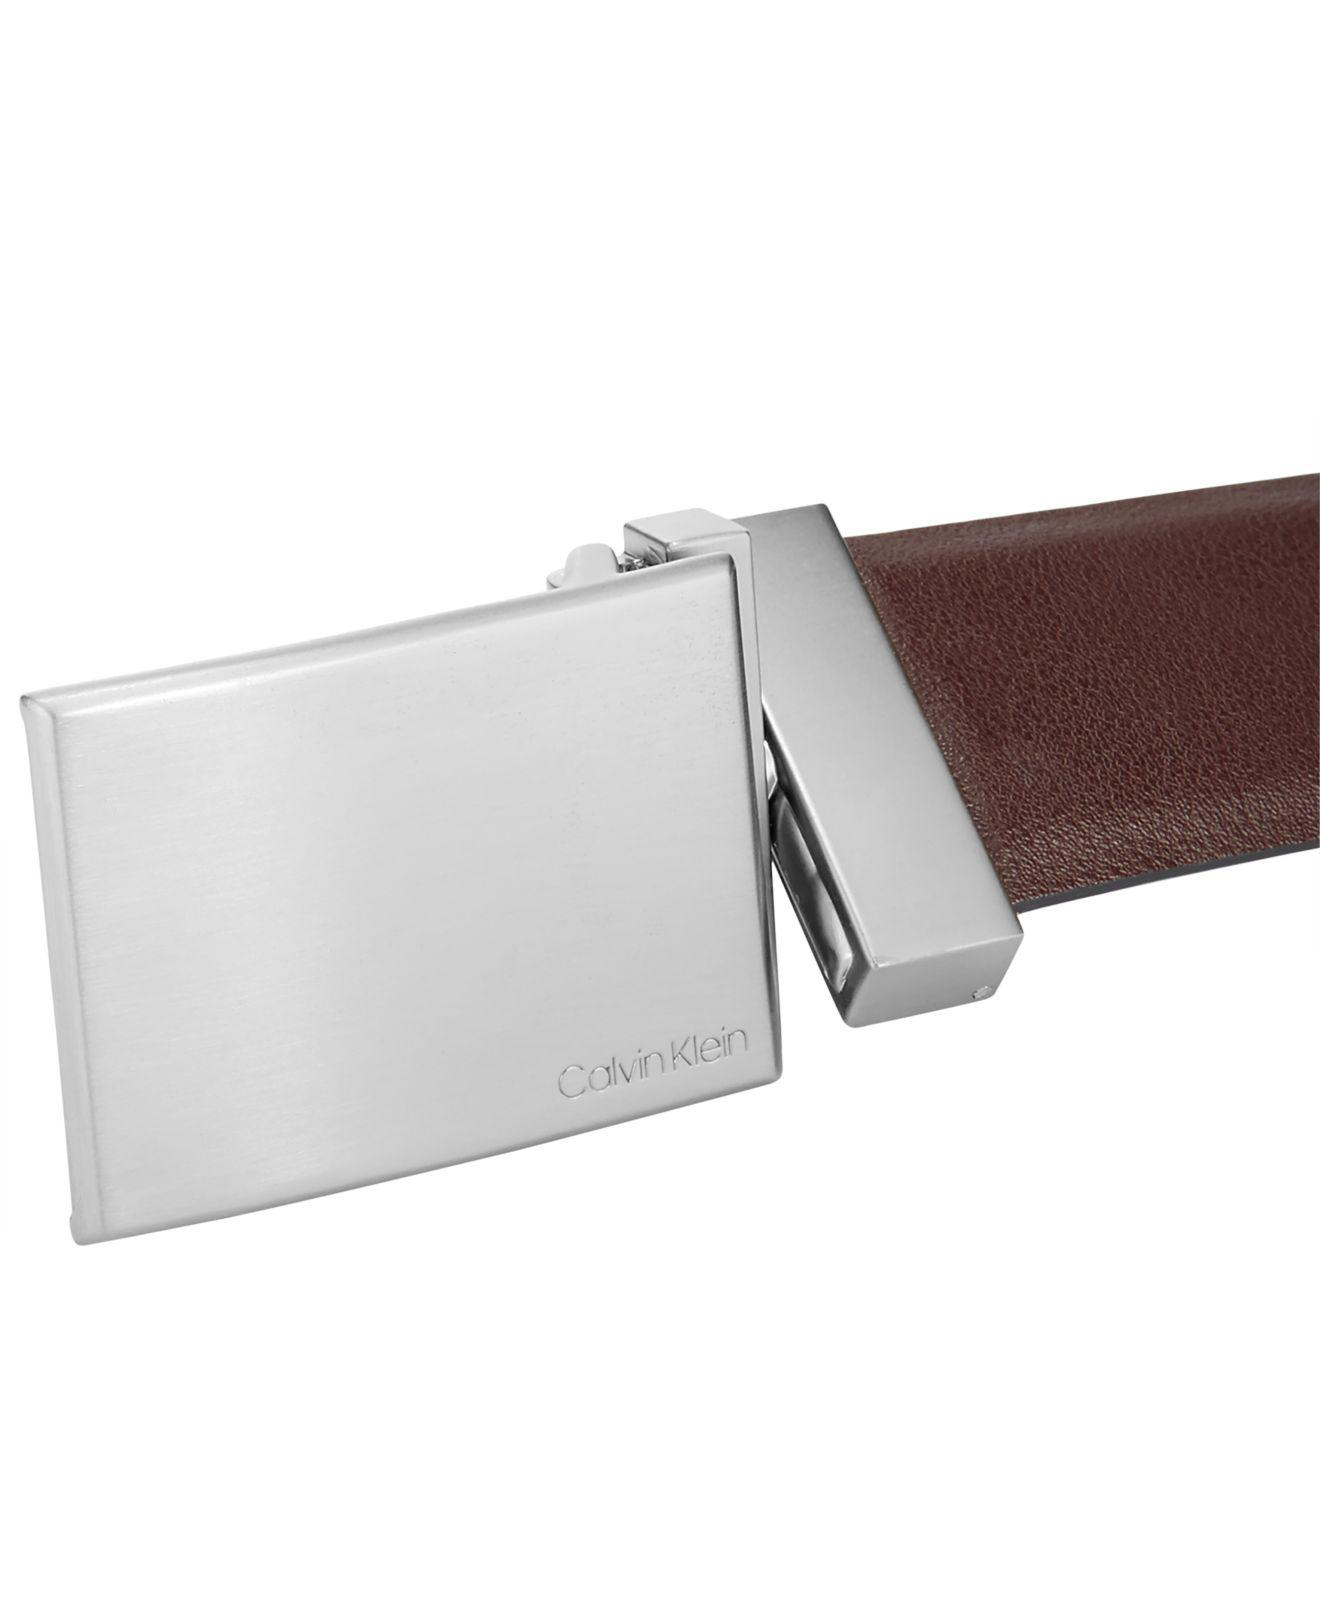 Lyst - Calvin Klein 4-way Reversible Boxed Belt Set in Brown for Men f28c025abe